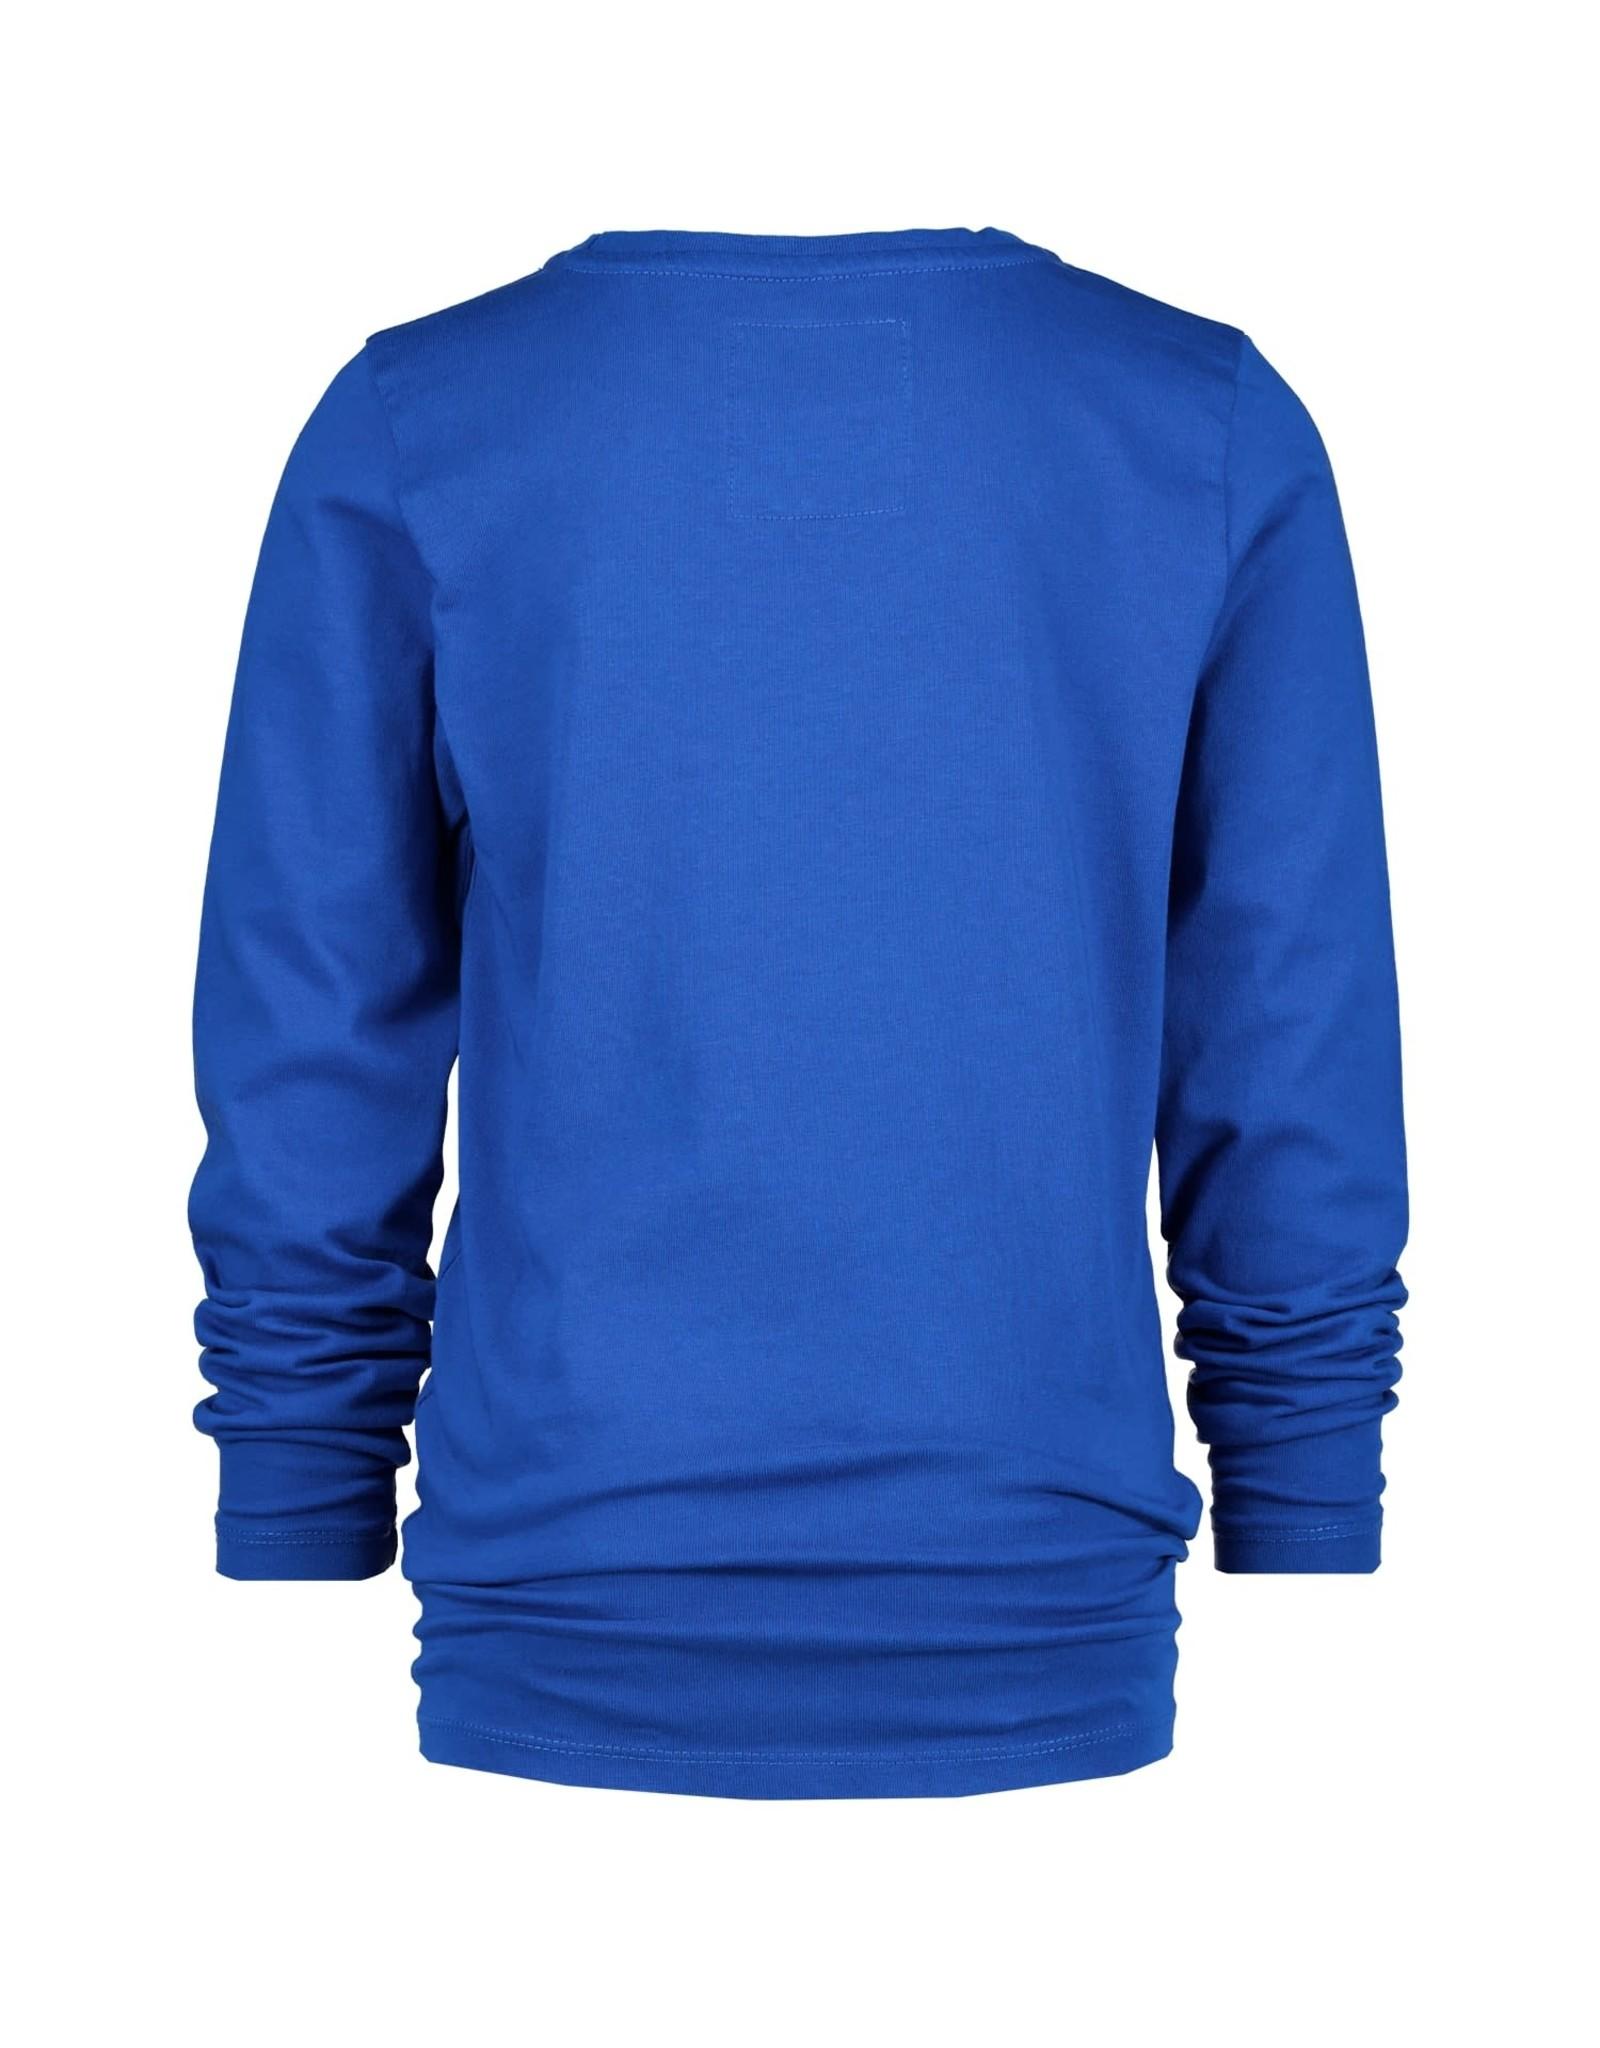 Vingino Vingino jongens shirt Jackx Pool Blue